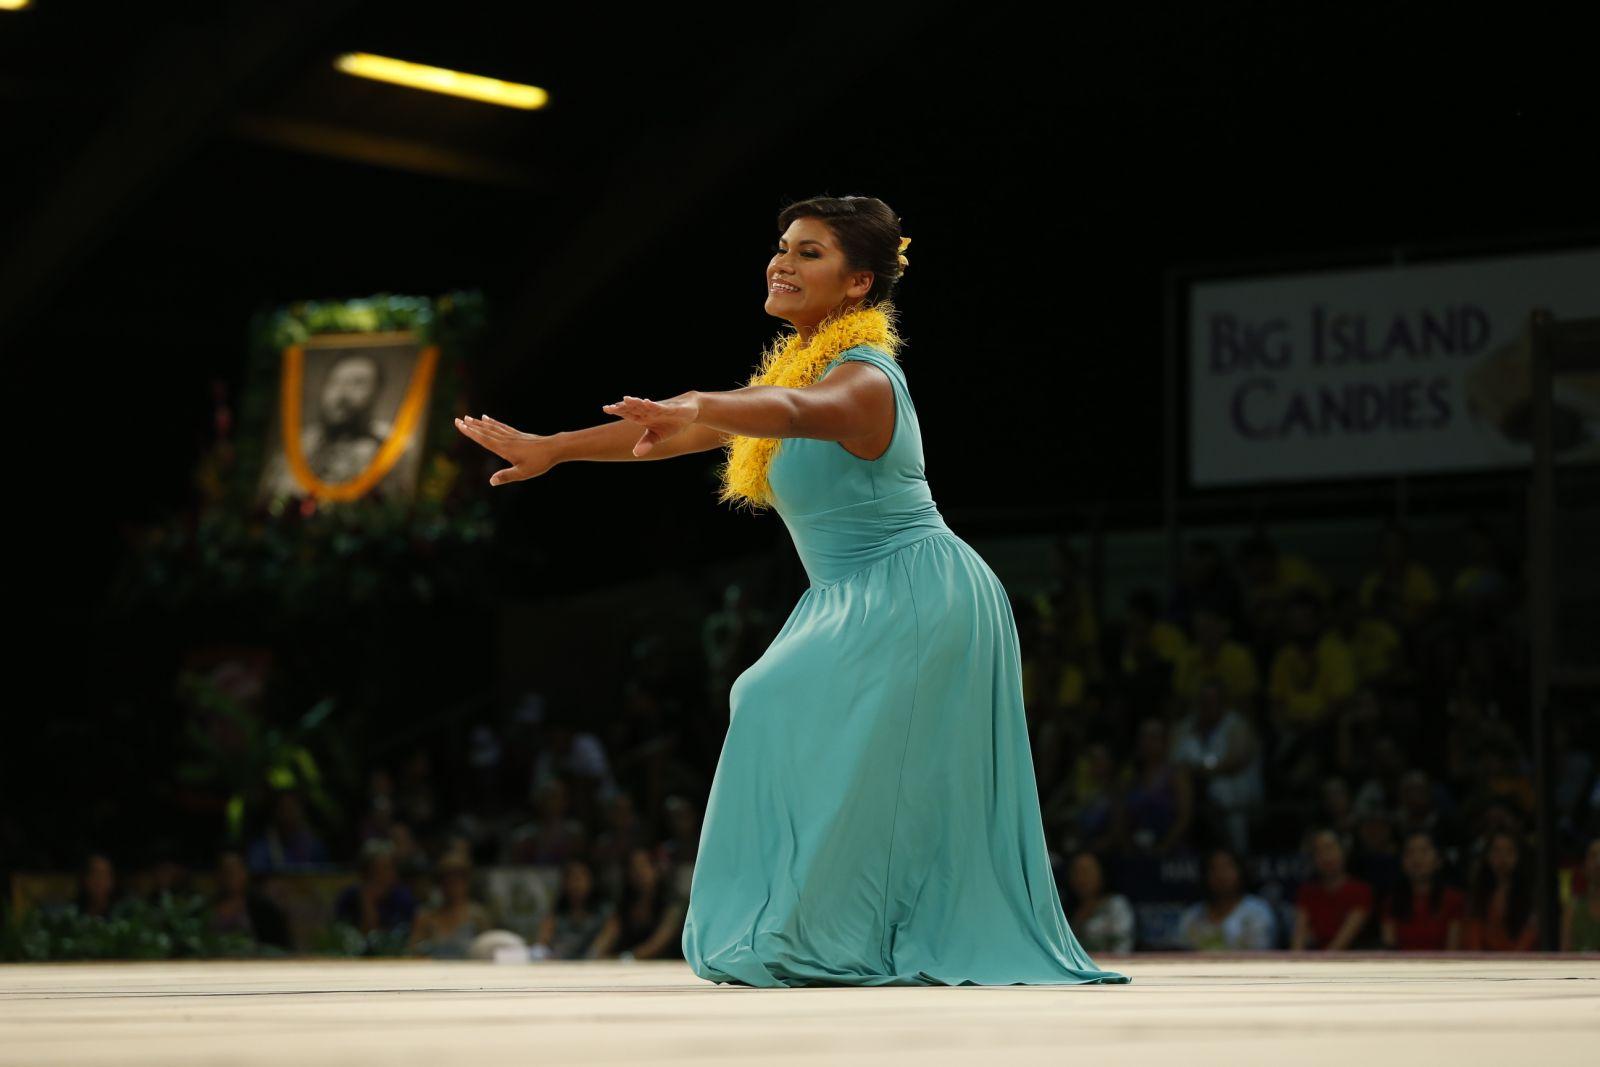 First Runner Up – Juleyn Machiko Kaloke Kaluna